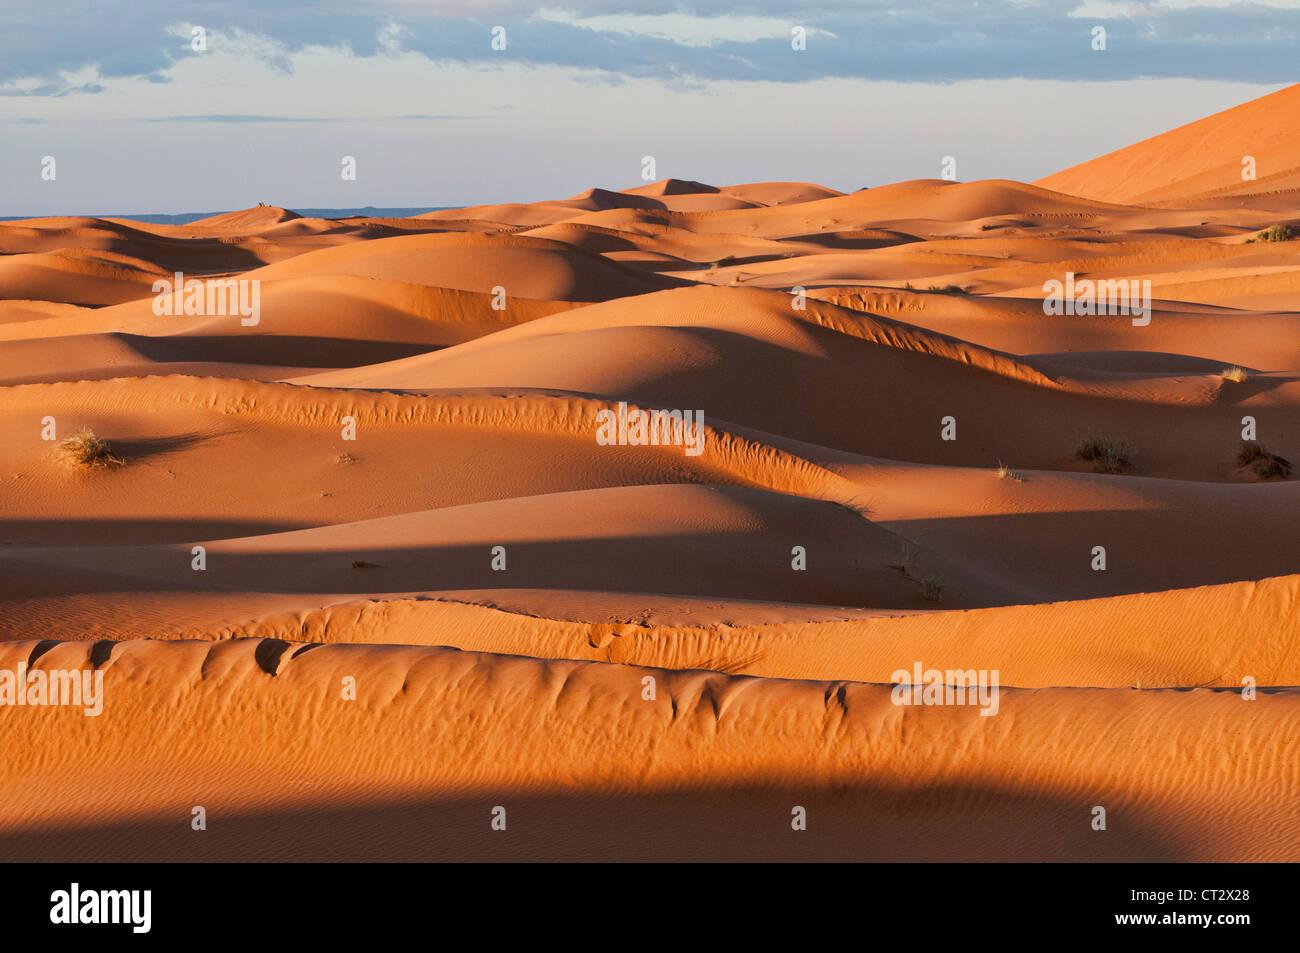 beautiful sand dunes at sunrise in the Sahara near Merzouga, Erg Chebbi, Morocco - Stock Image